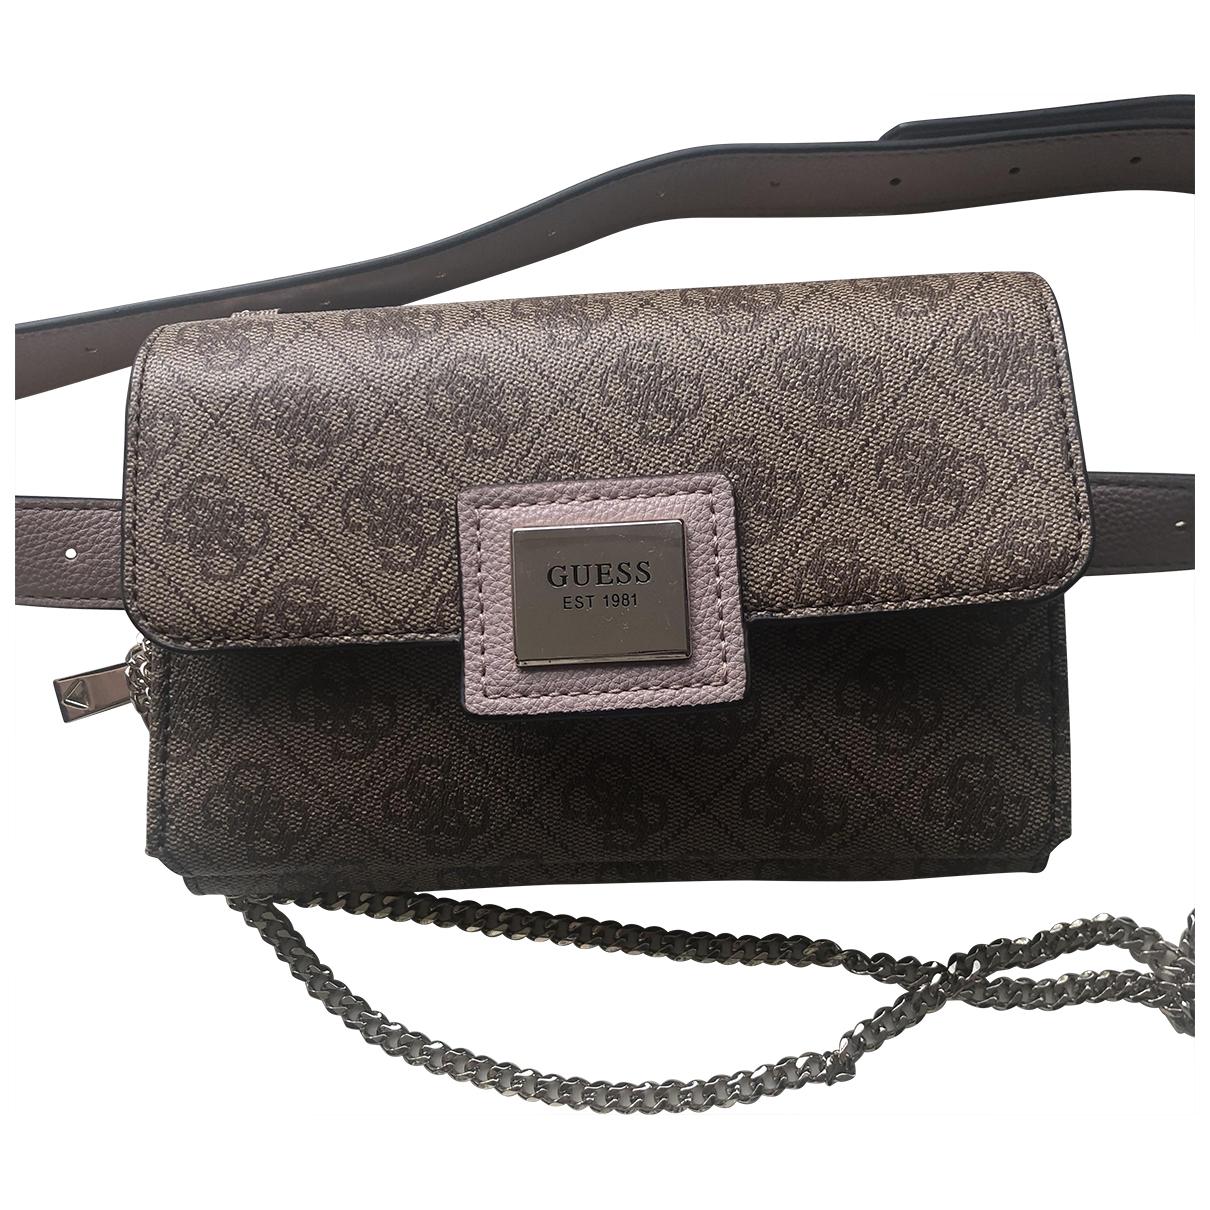 Guess \N Beige Clutch bag for Women \N